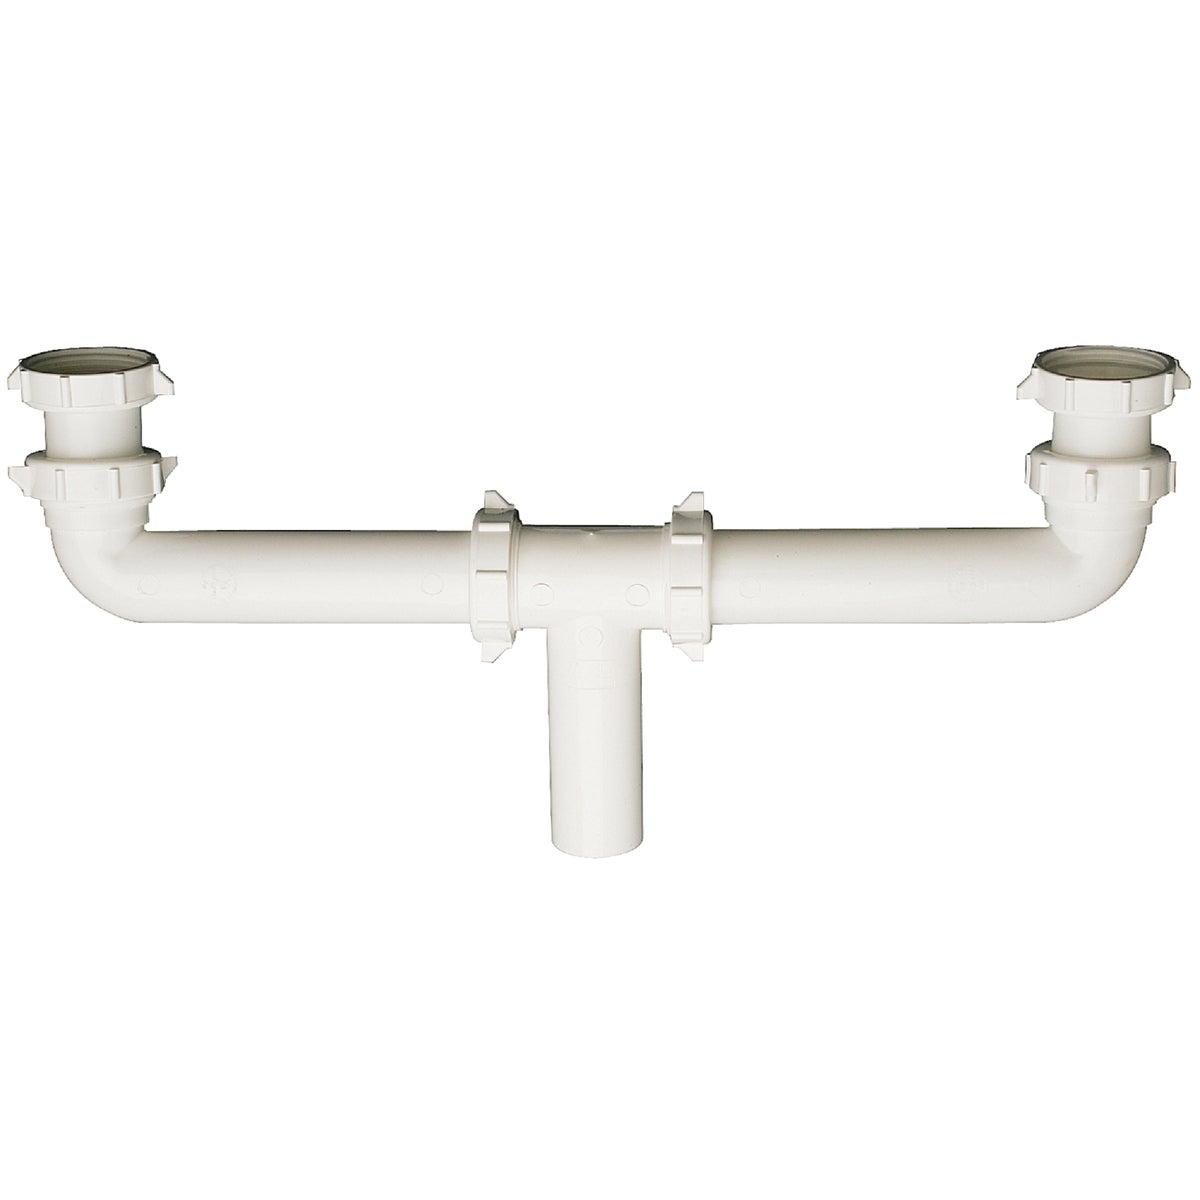 Plumb Pak/Keeney Mfg. 1-1/2X16 CTR OUTLT WASTE 415045